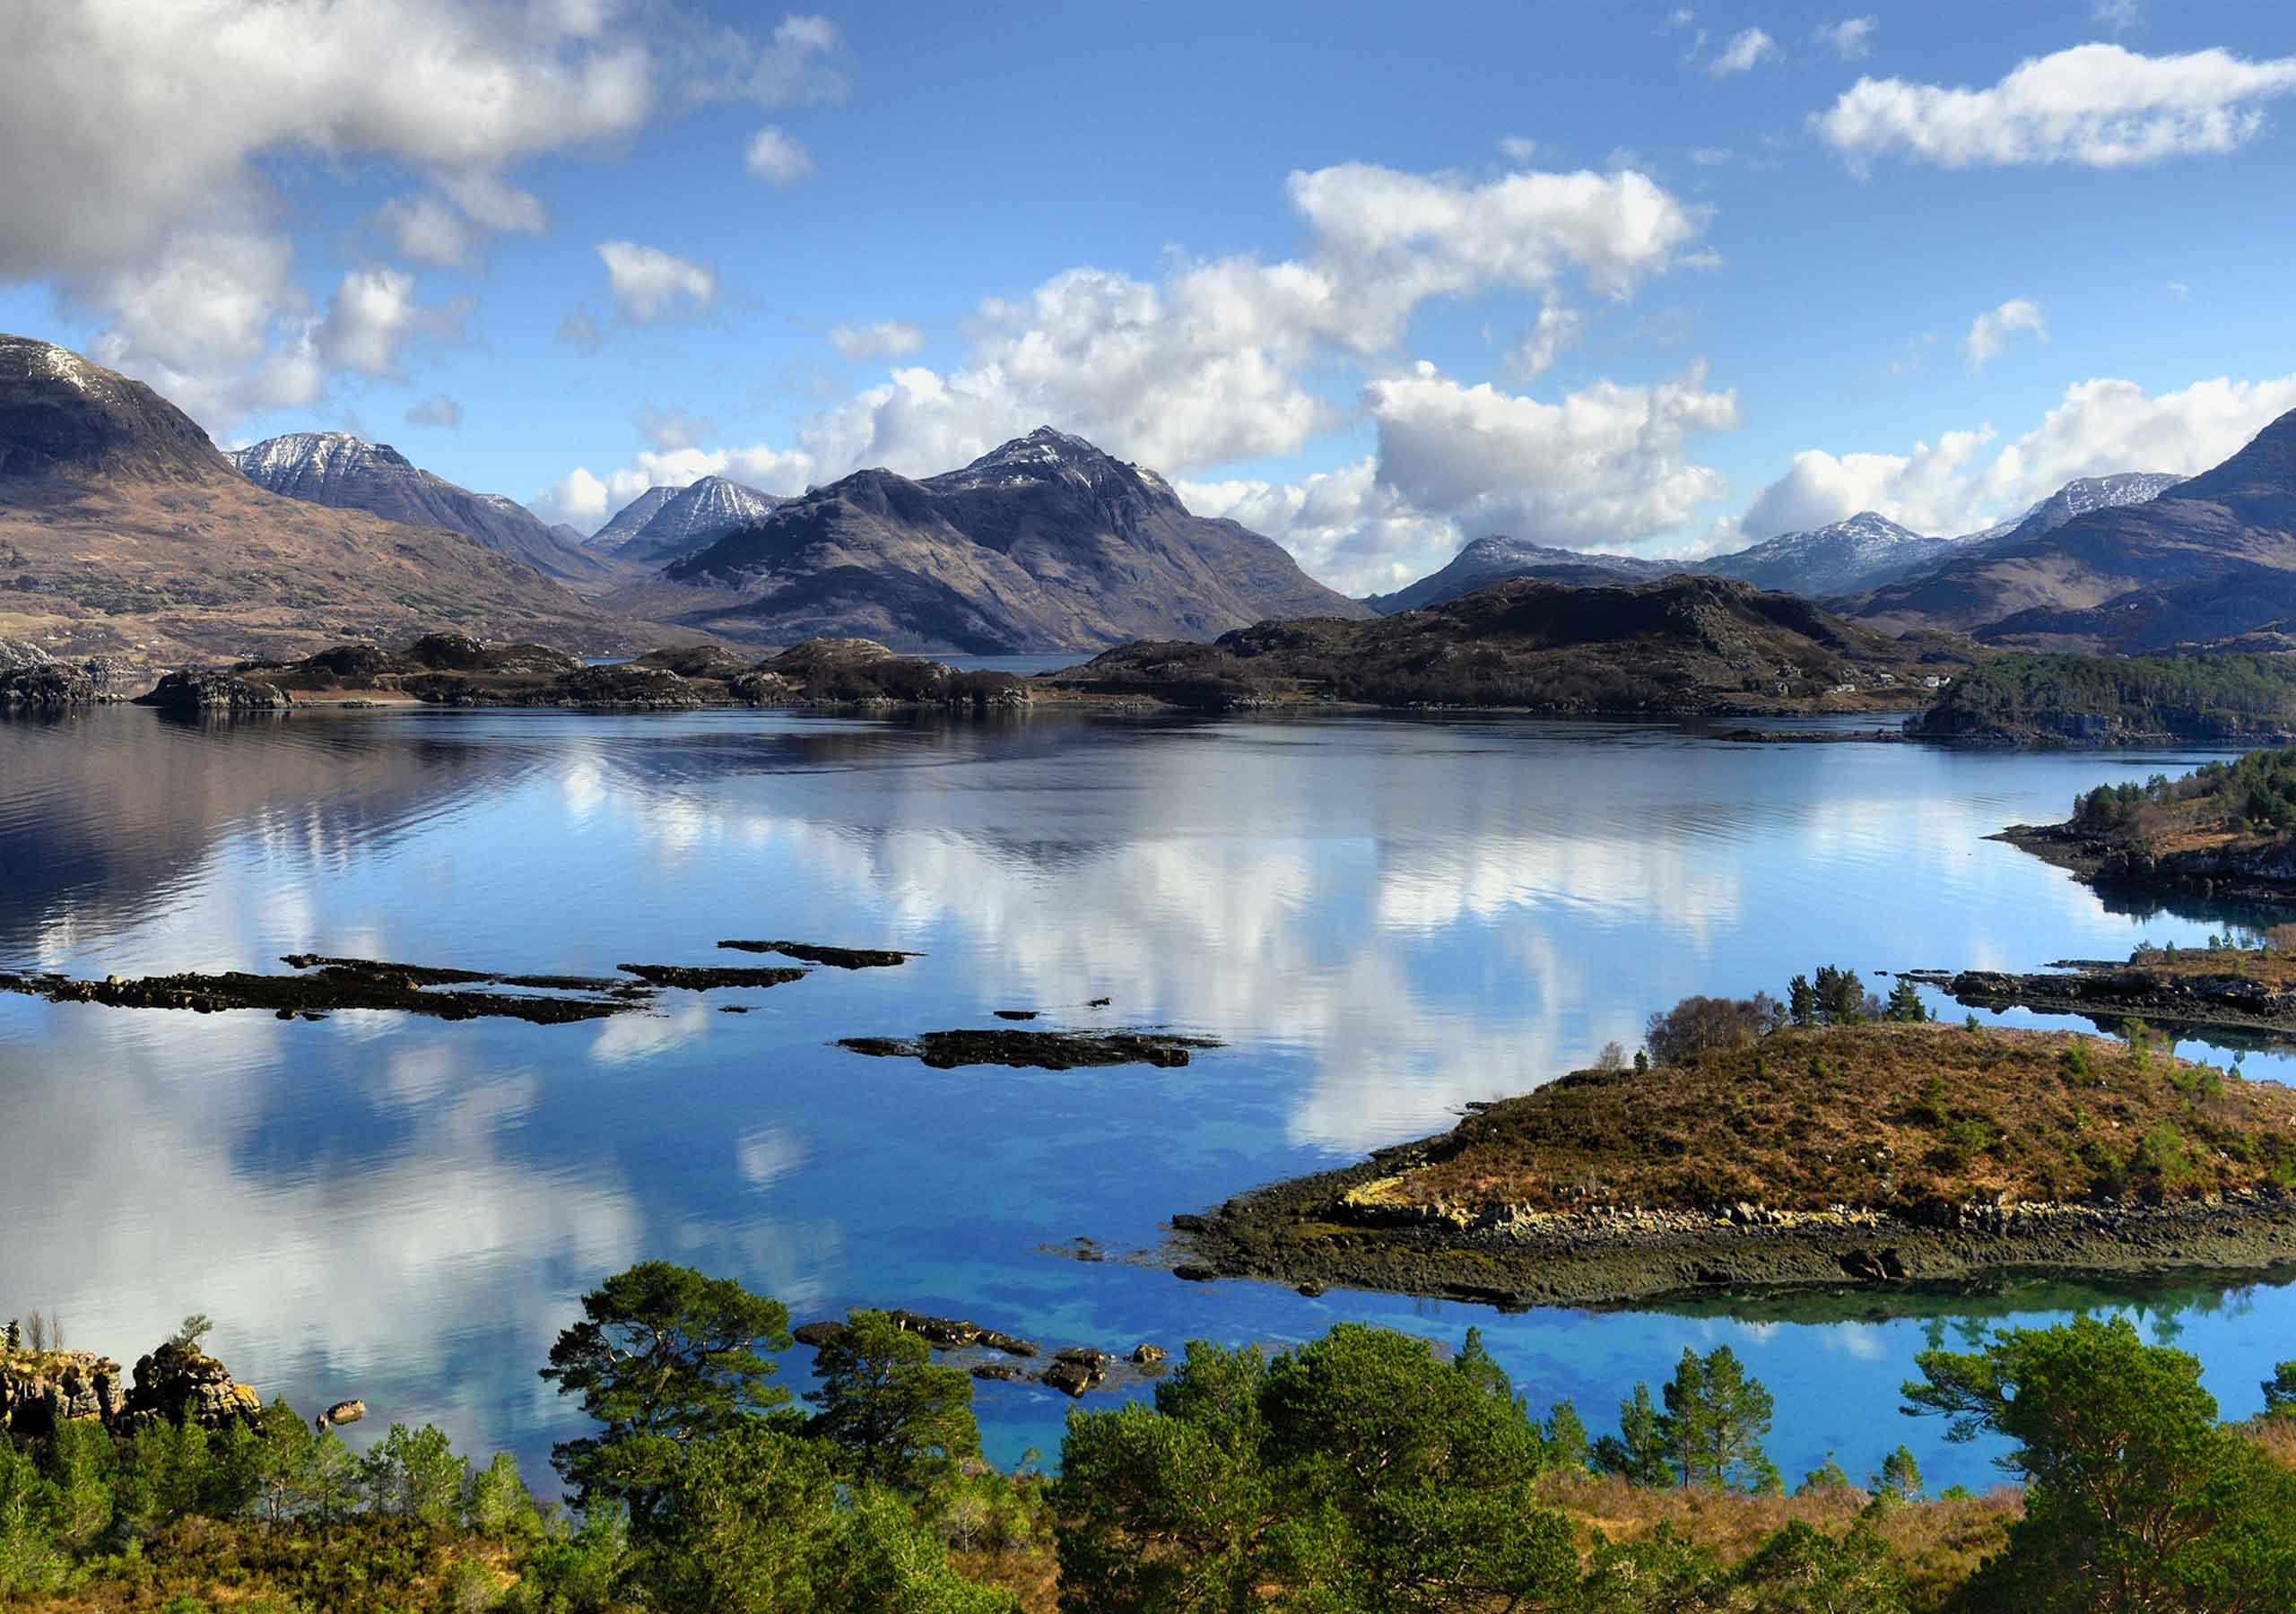 Loch Torridon Panoramic image